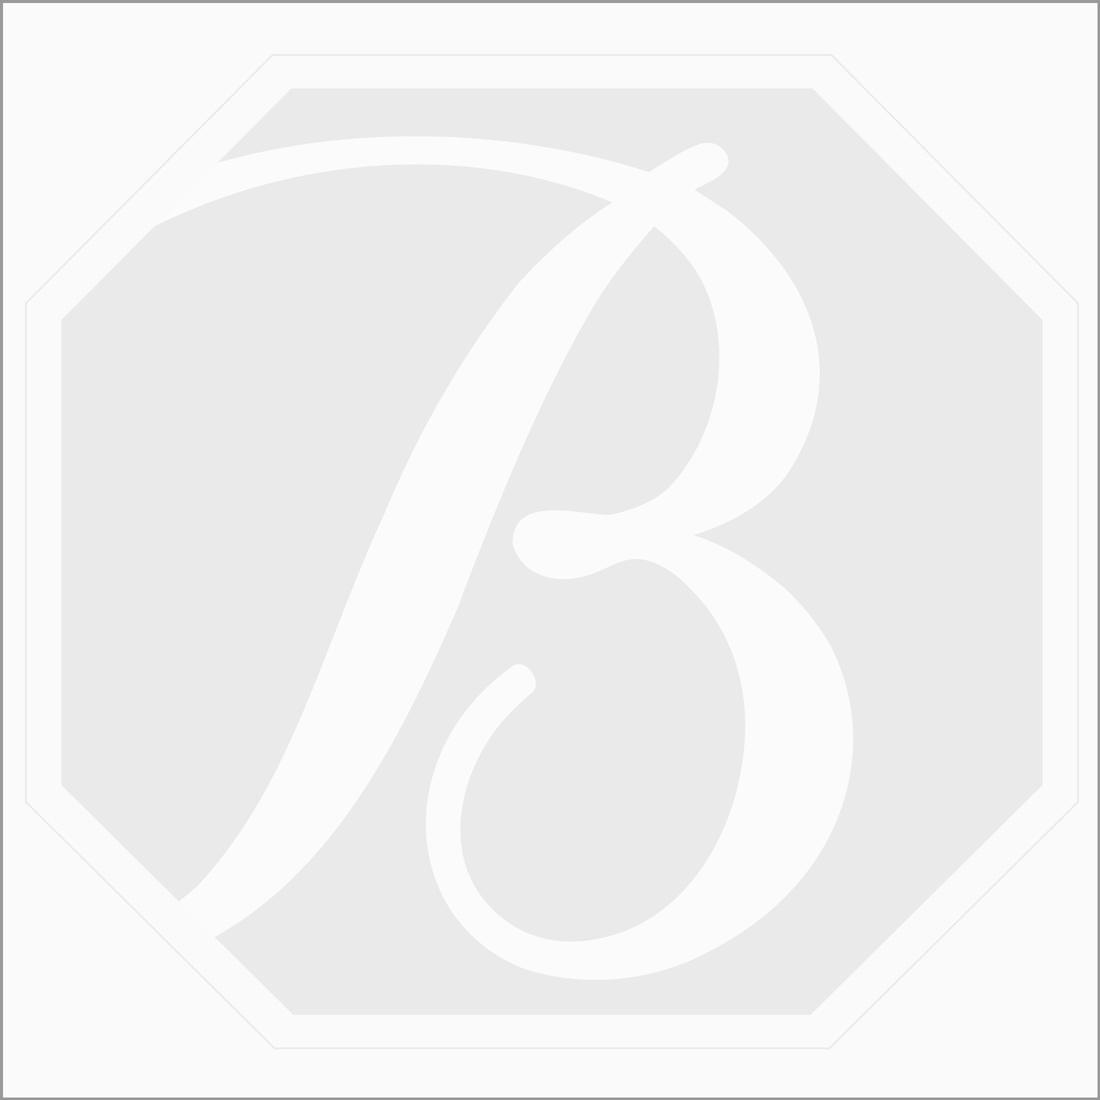 29 Pcs - Light Blue Aquamarine Rose Cut - 67.70 ct. - 8.8 x 6.8 mm to 16.6 x 11.6 mm (AQRC1021)